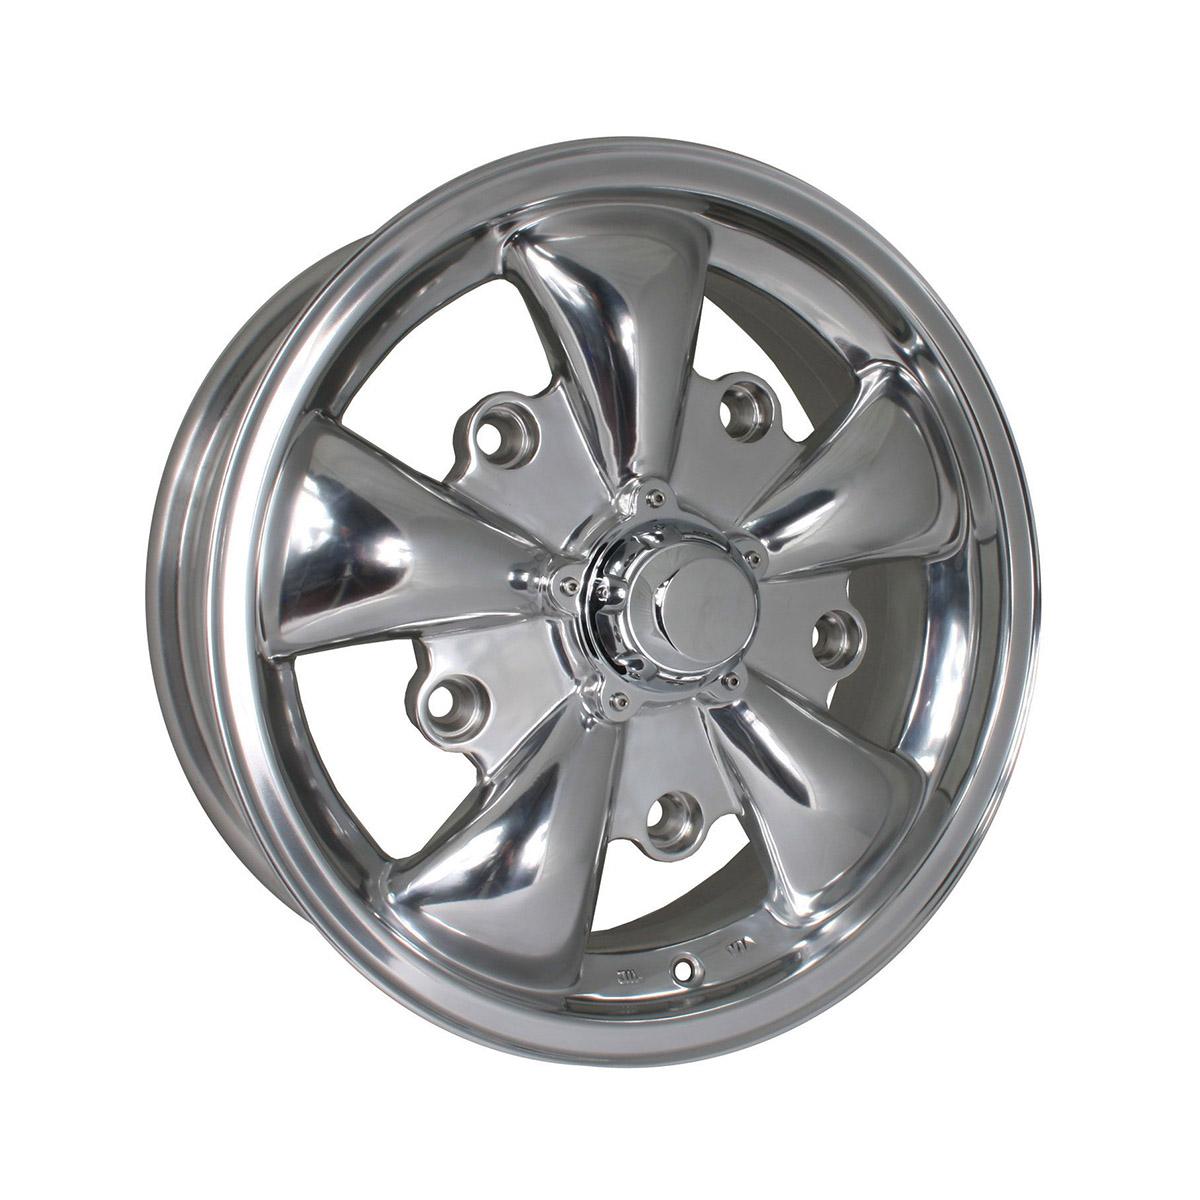 "Felga SSP GT 5 Spoke Polished Alloy Wheel 5.5Jx15"" VW Garbus, Bus T1"